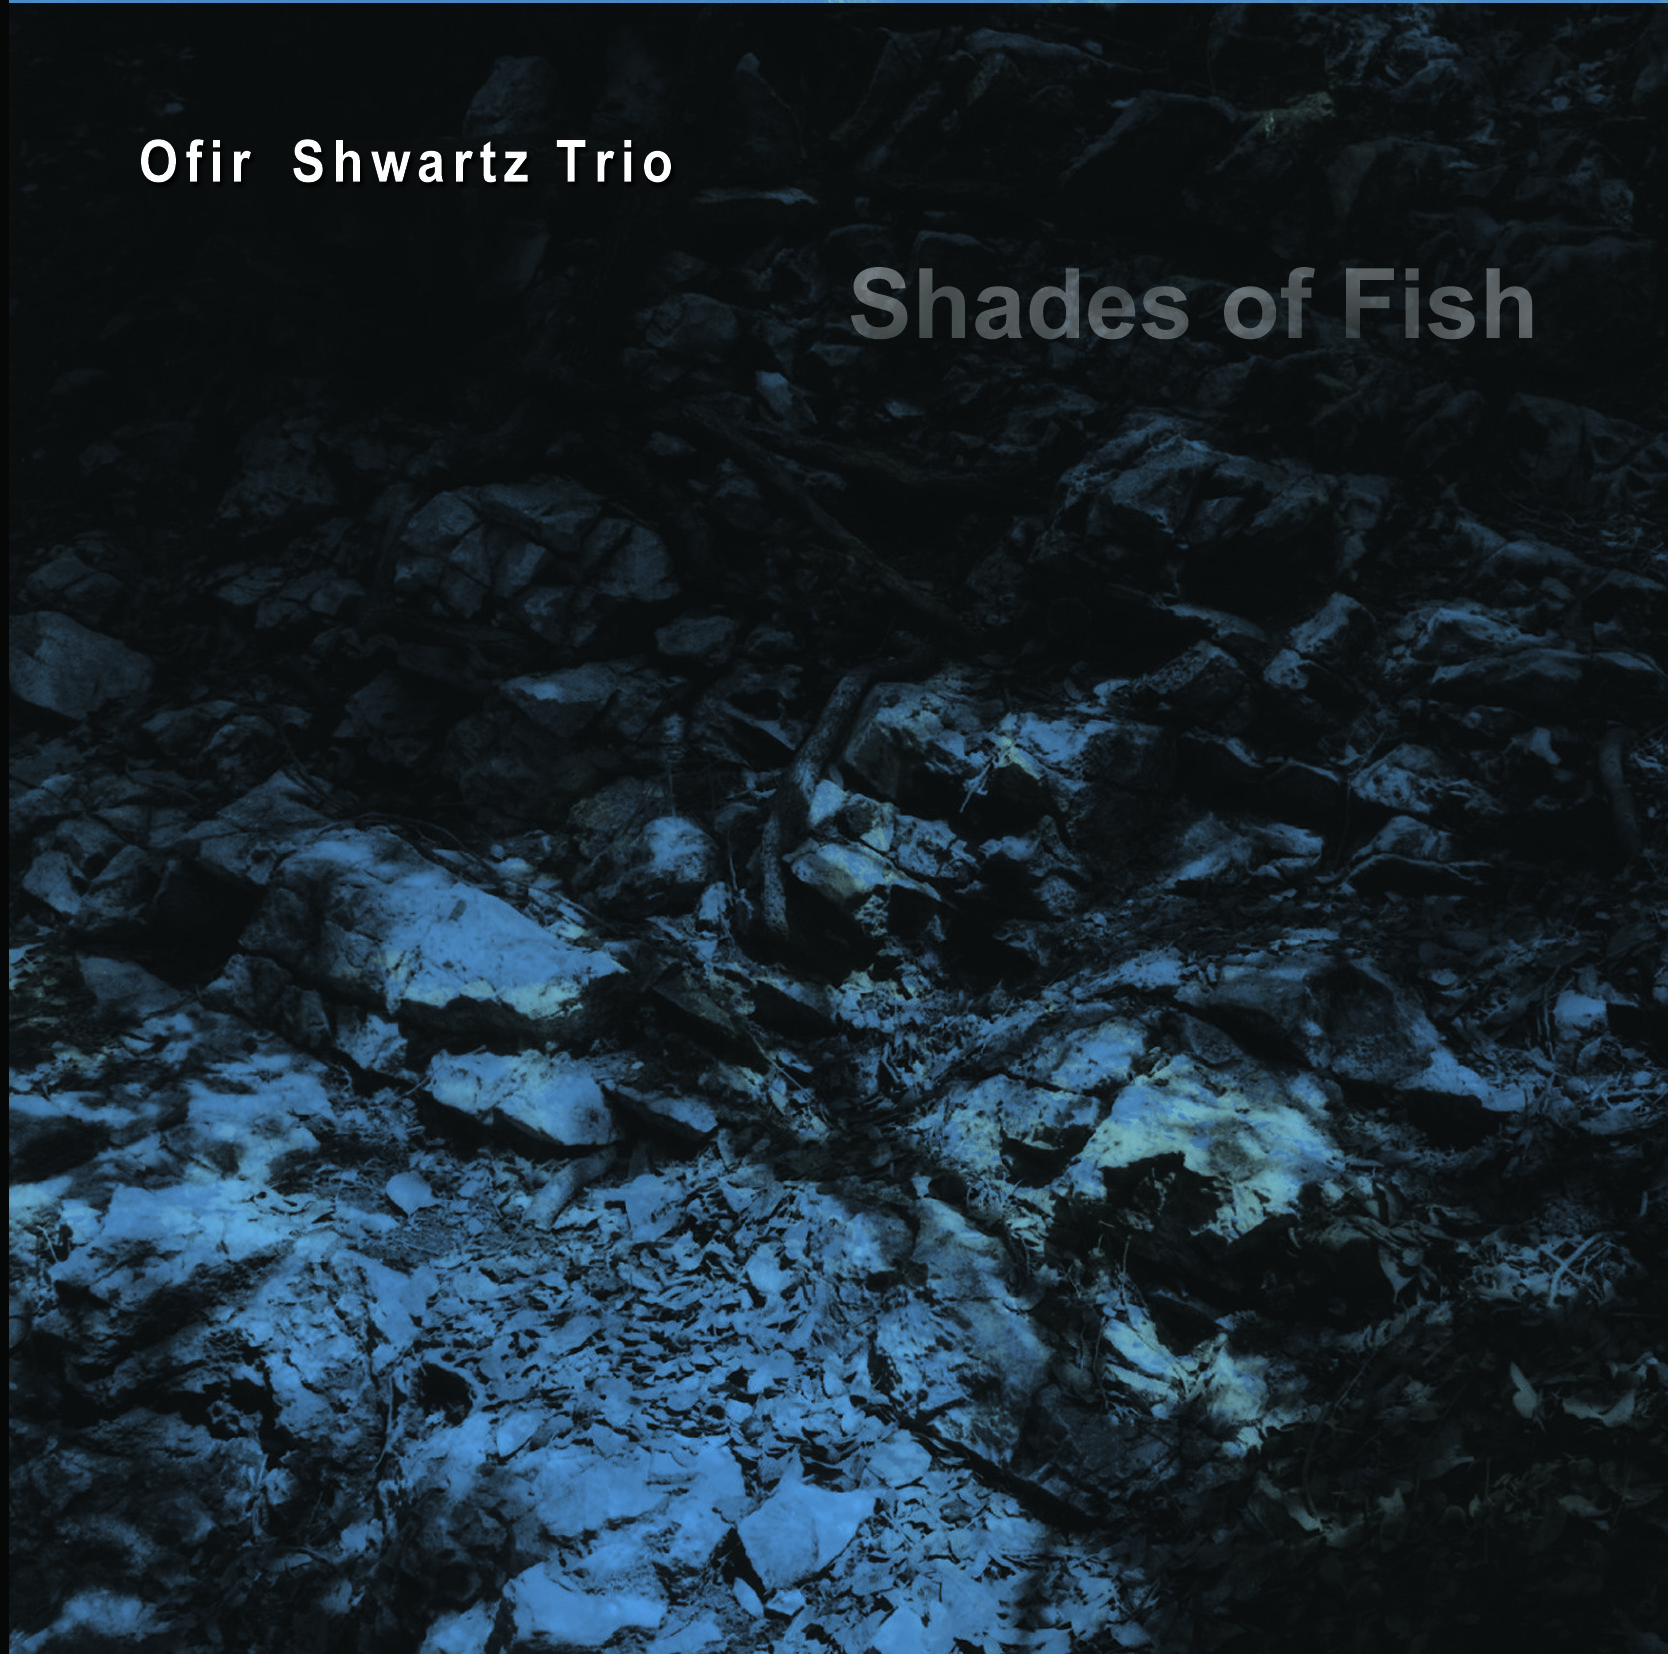 Ofir Shwartz Trio: Shades of Fish 【予約受付中】